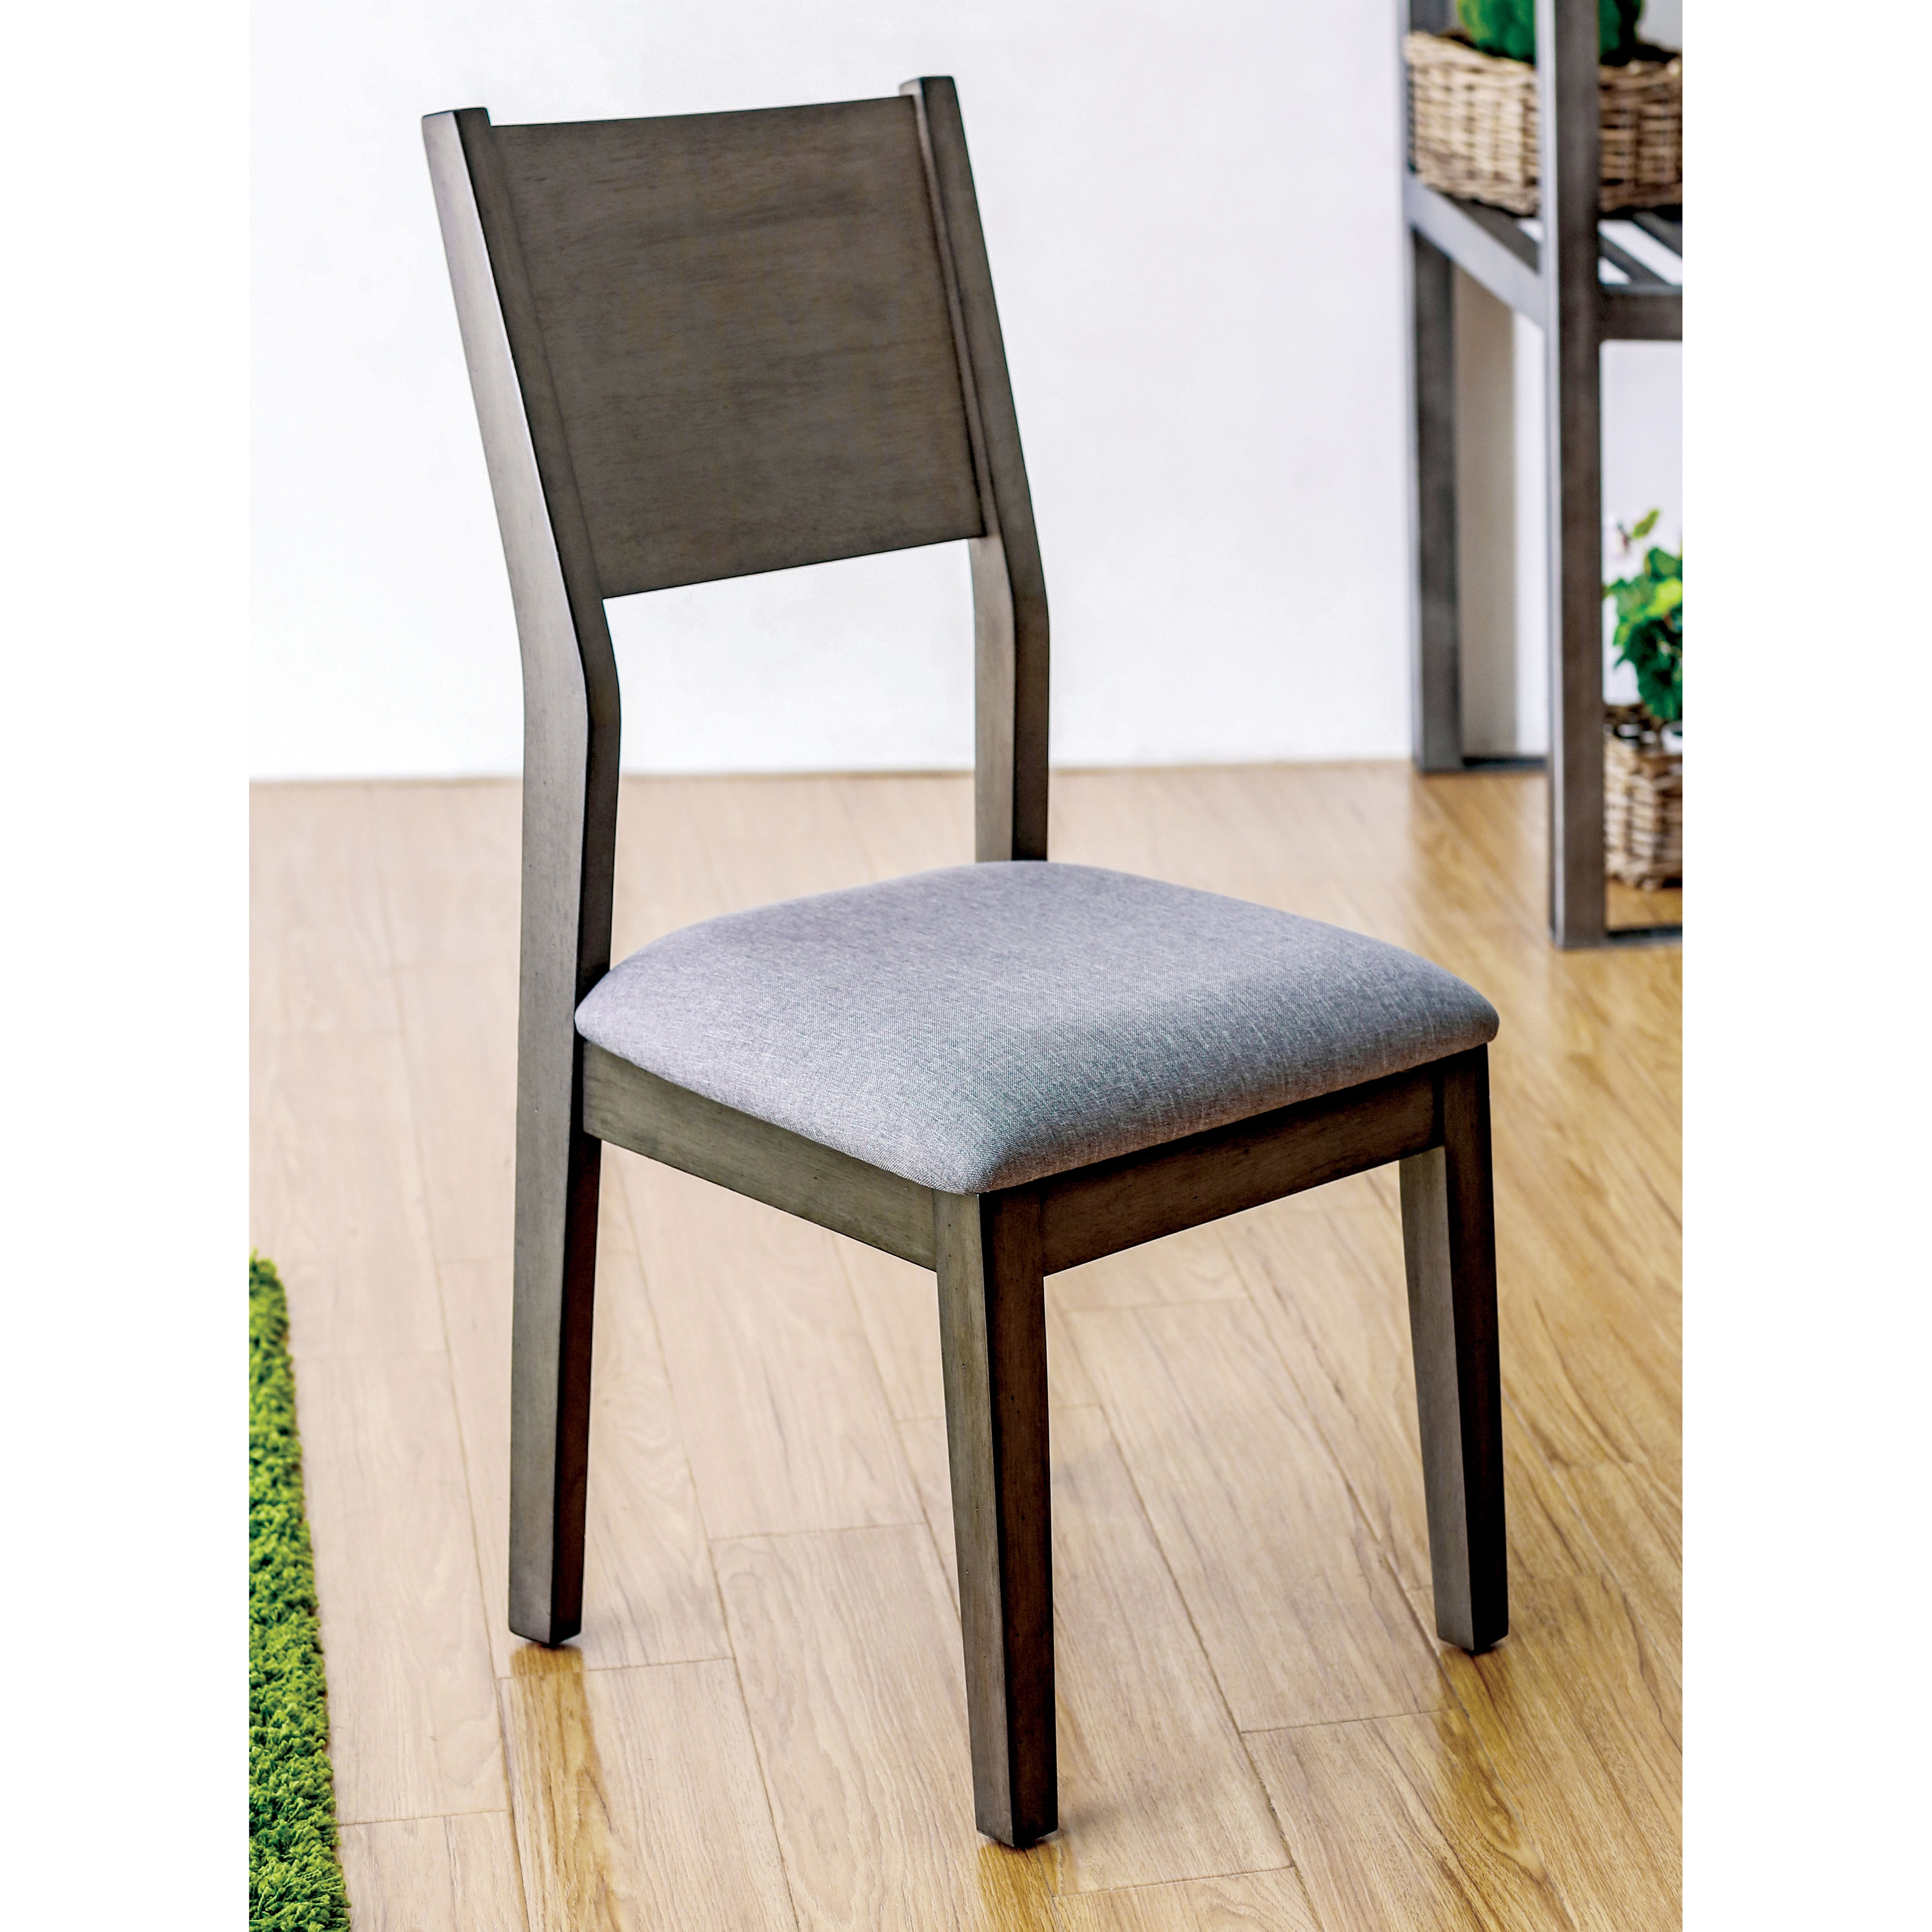 Furniture of America Timpton Contemporary Padded Fabric G...